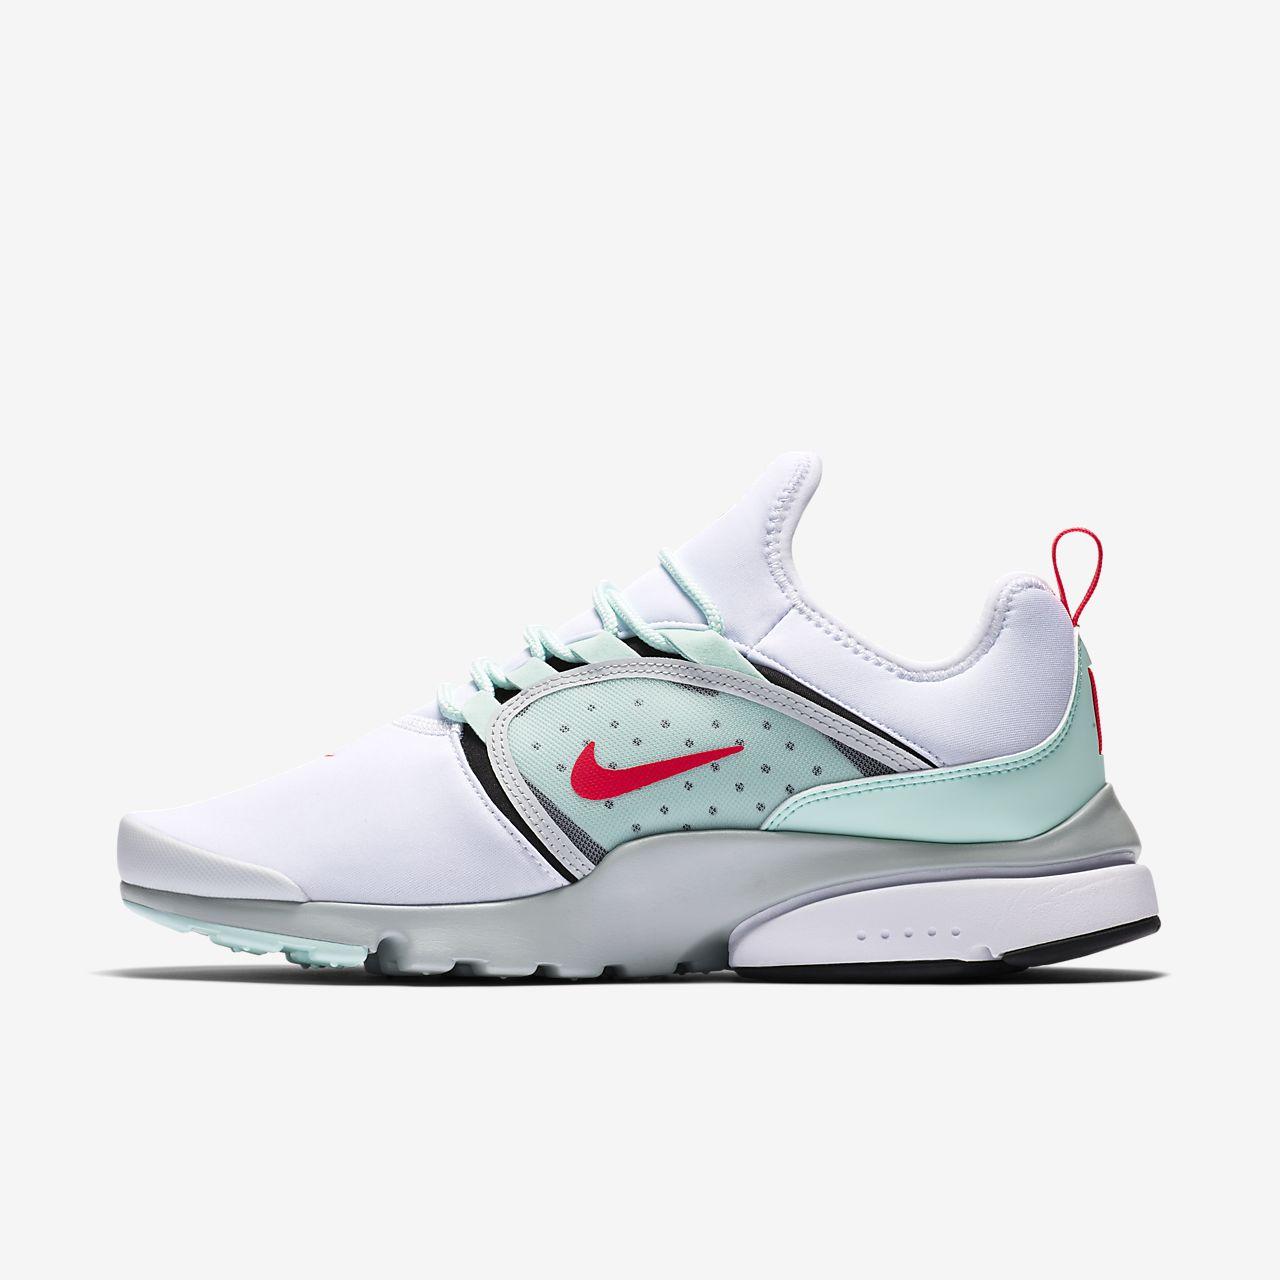 online store 0b620 6664f ... Scarpa Nike Presto Fly World - Uomo